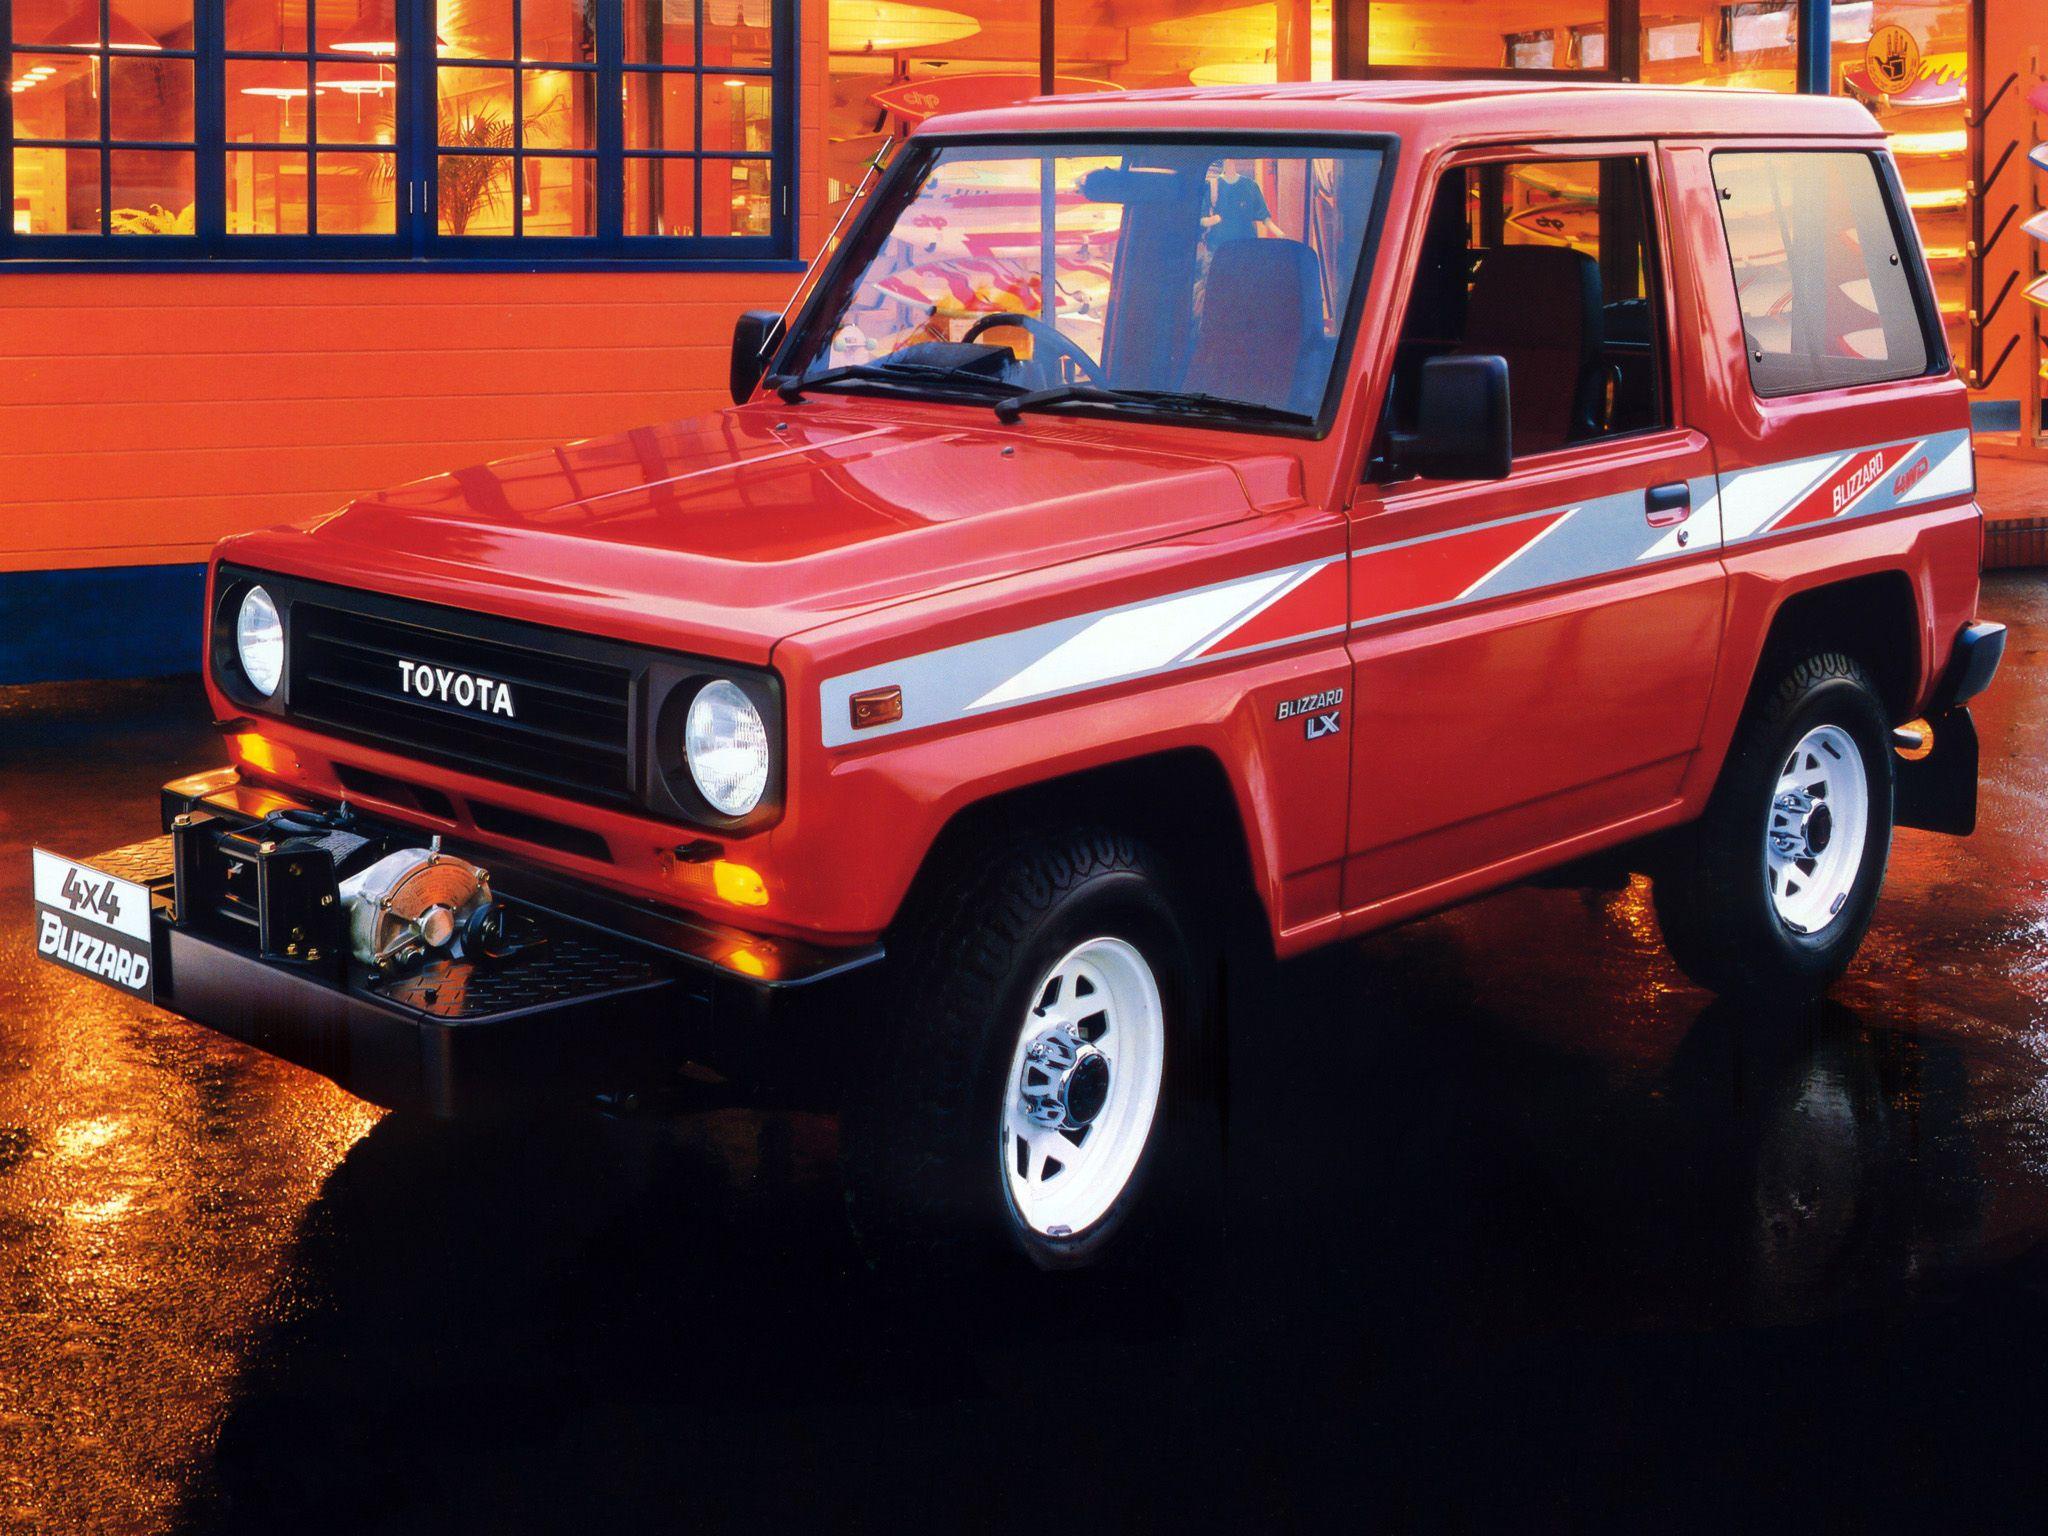 1990 Toyota Blizzard 18 Toyota Toyota Cars Daihatsu